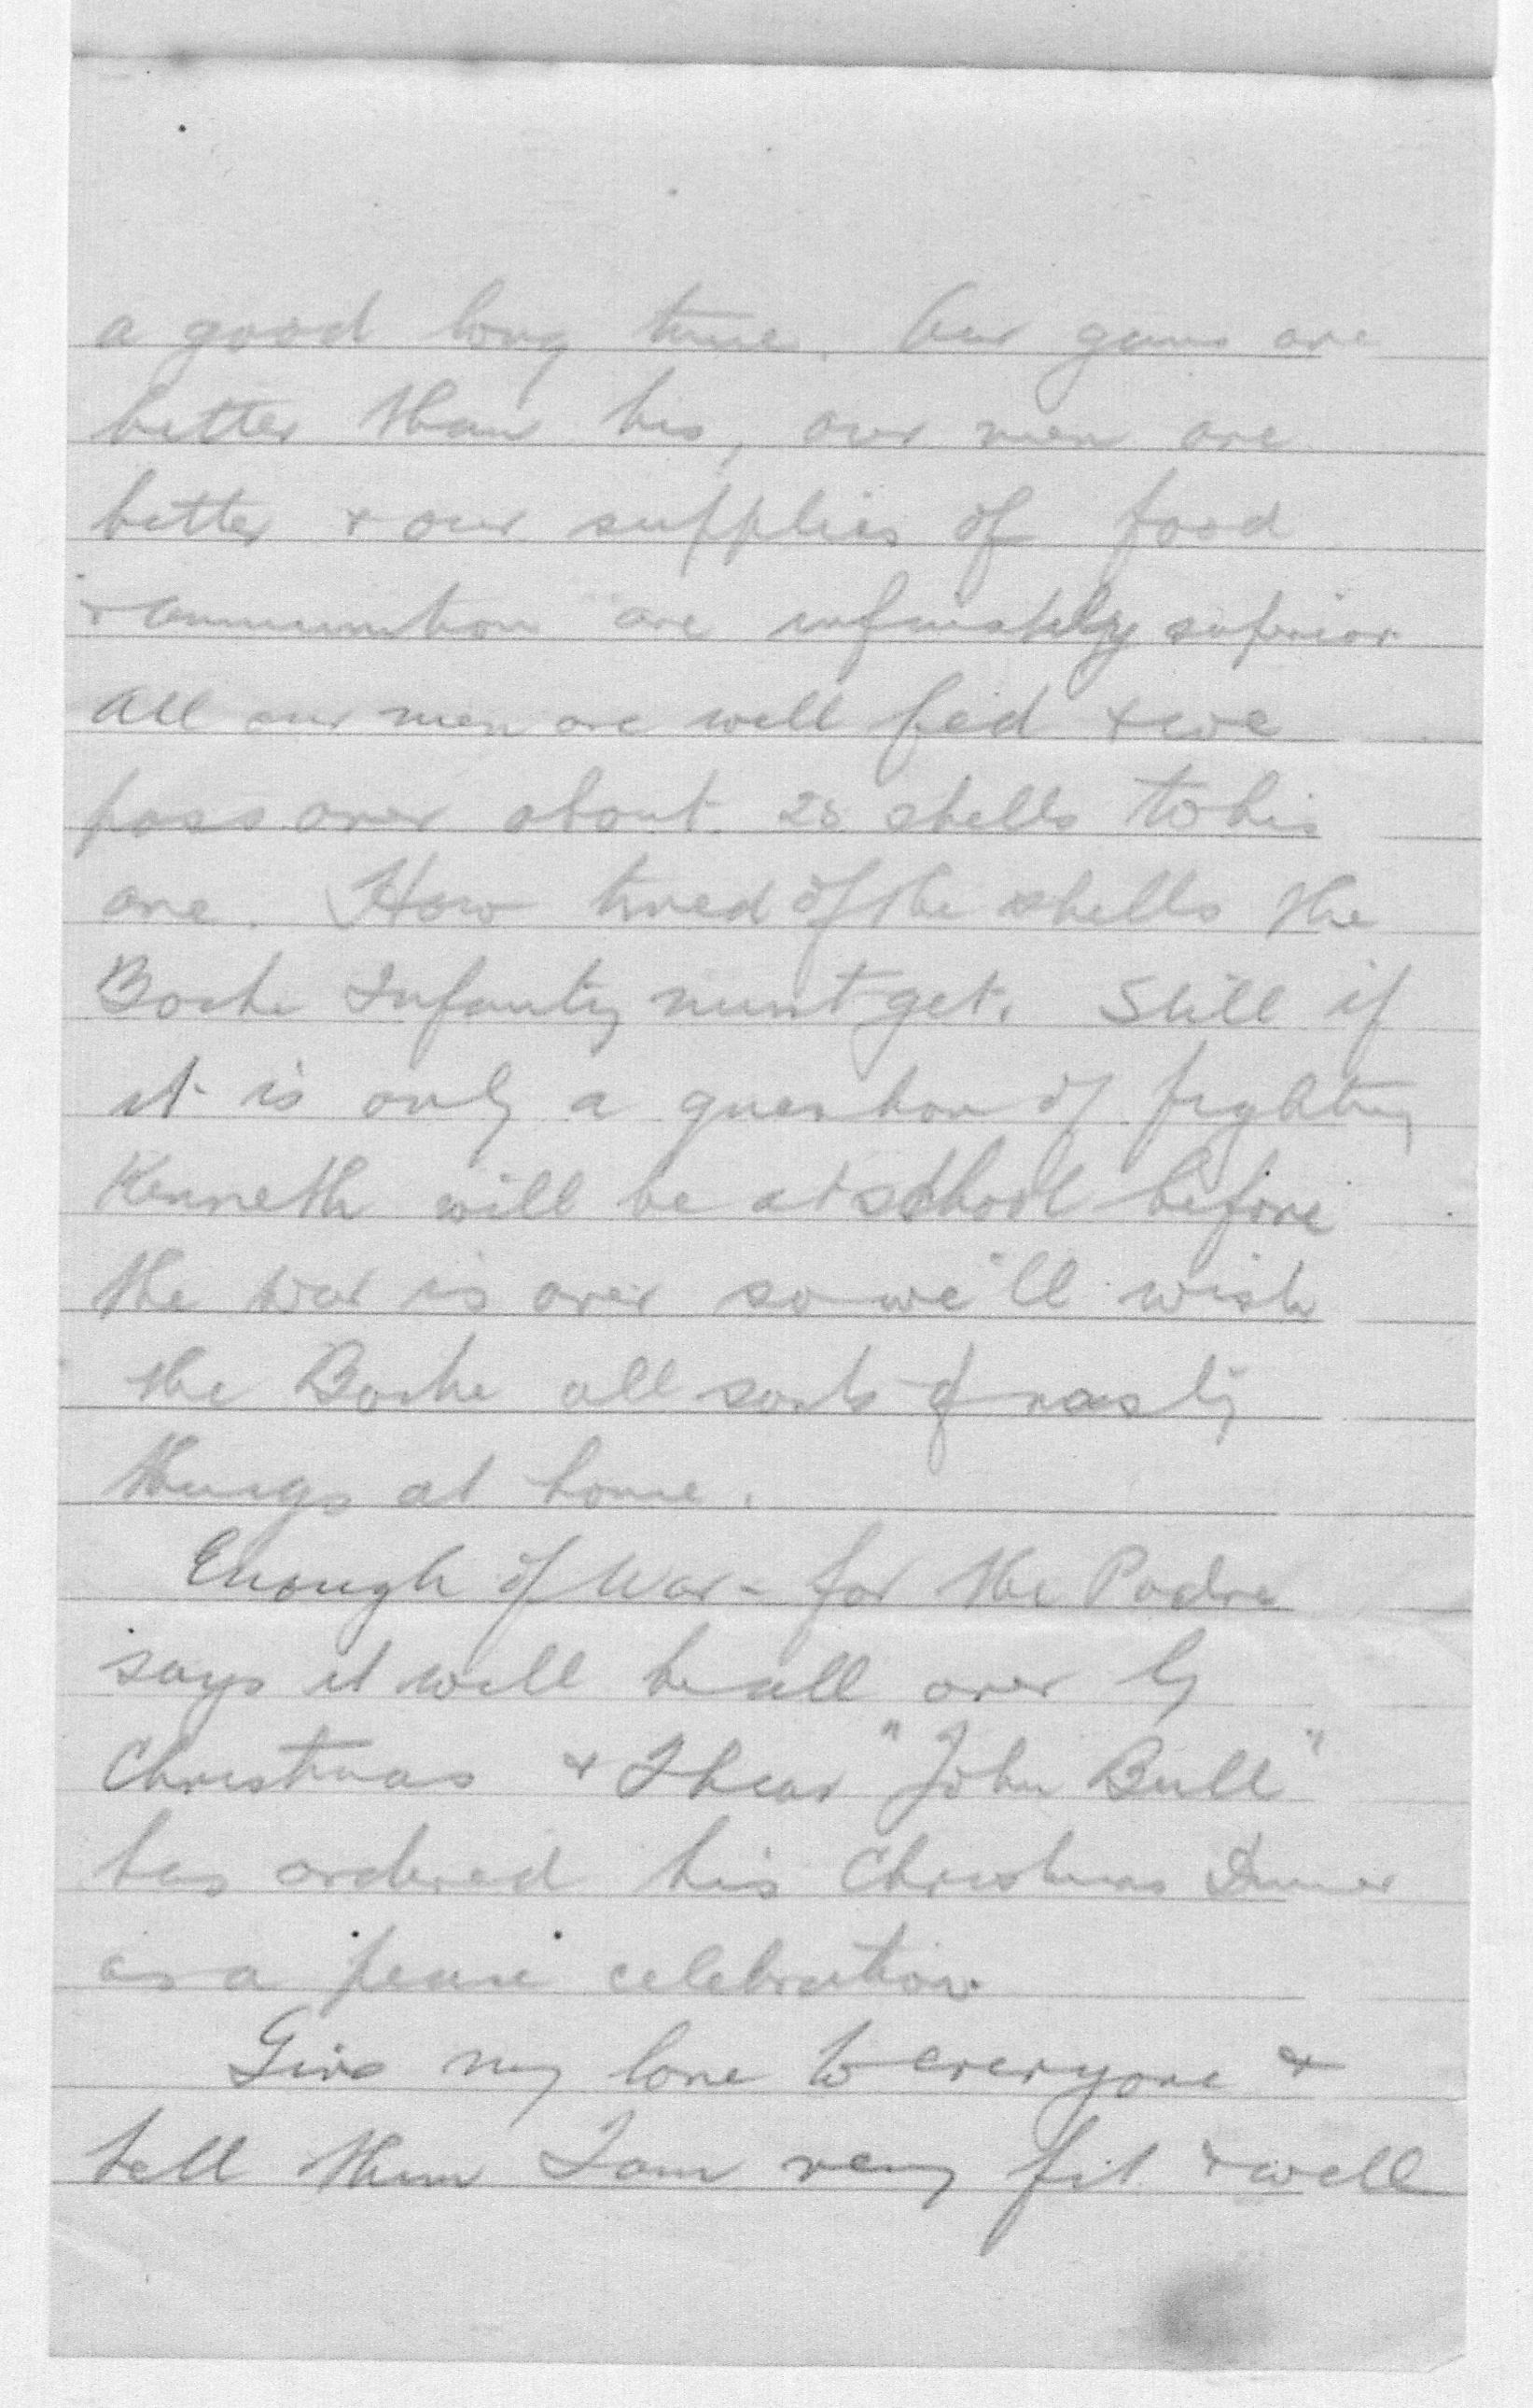 captain major harold ward correspondence item 517 transcribathon